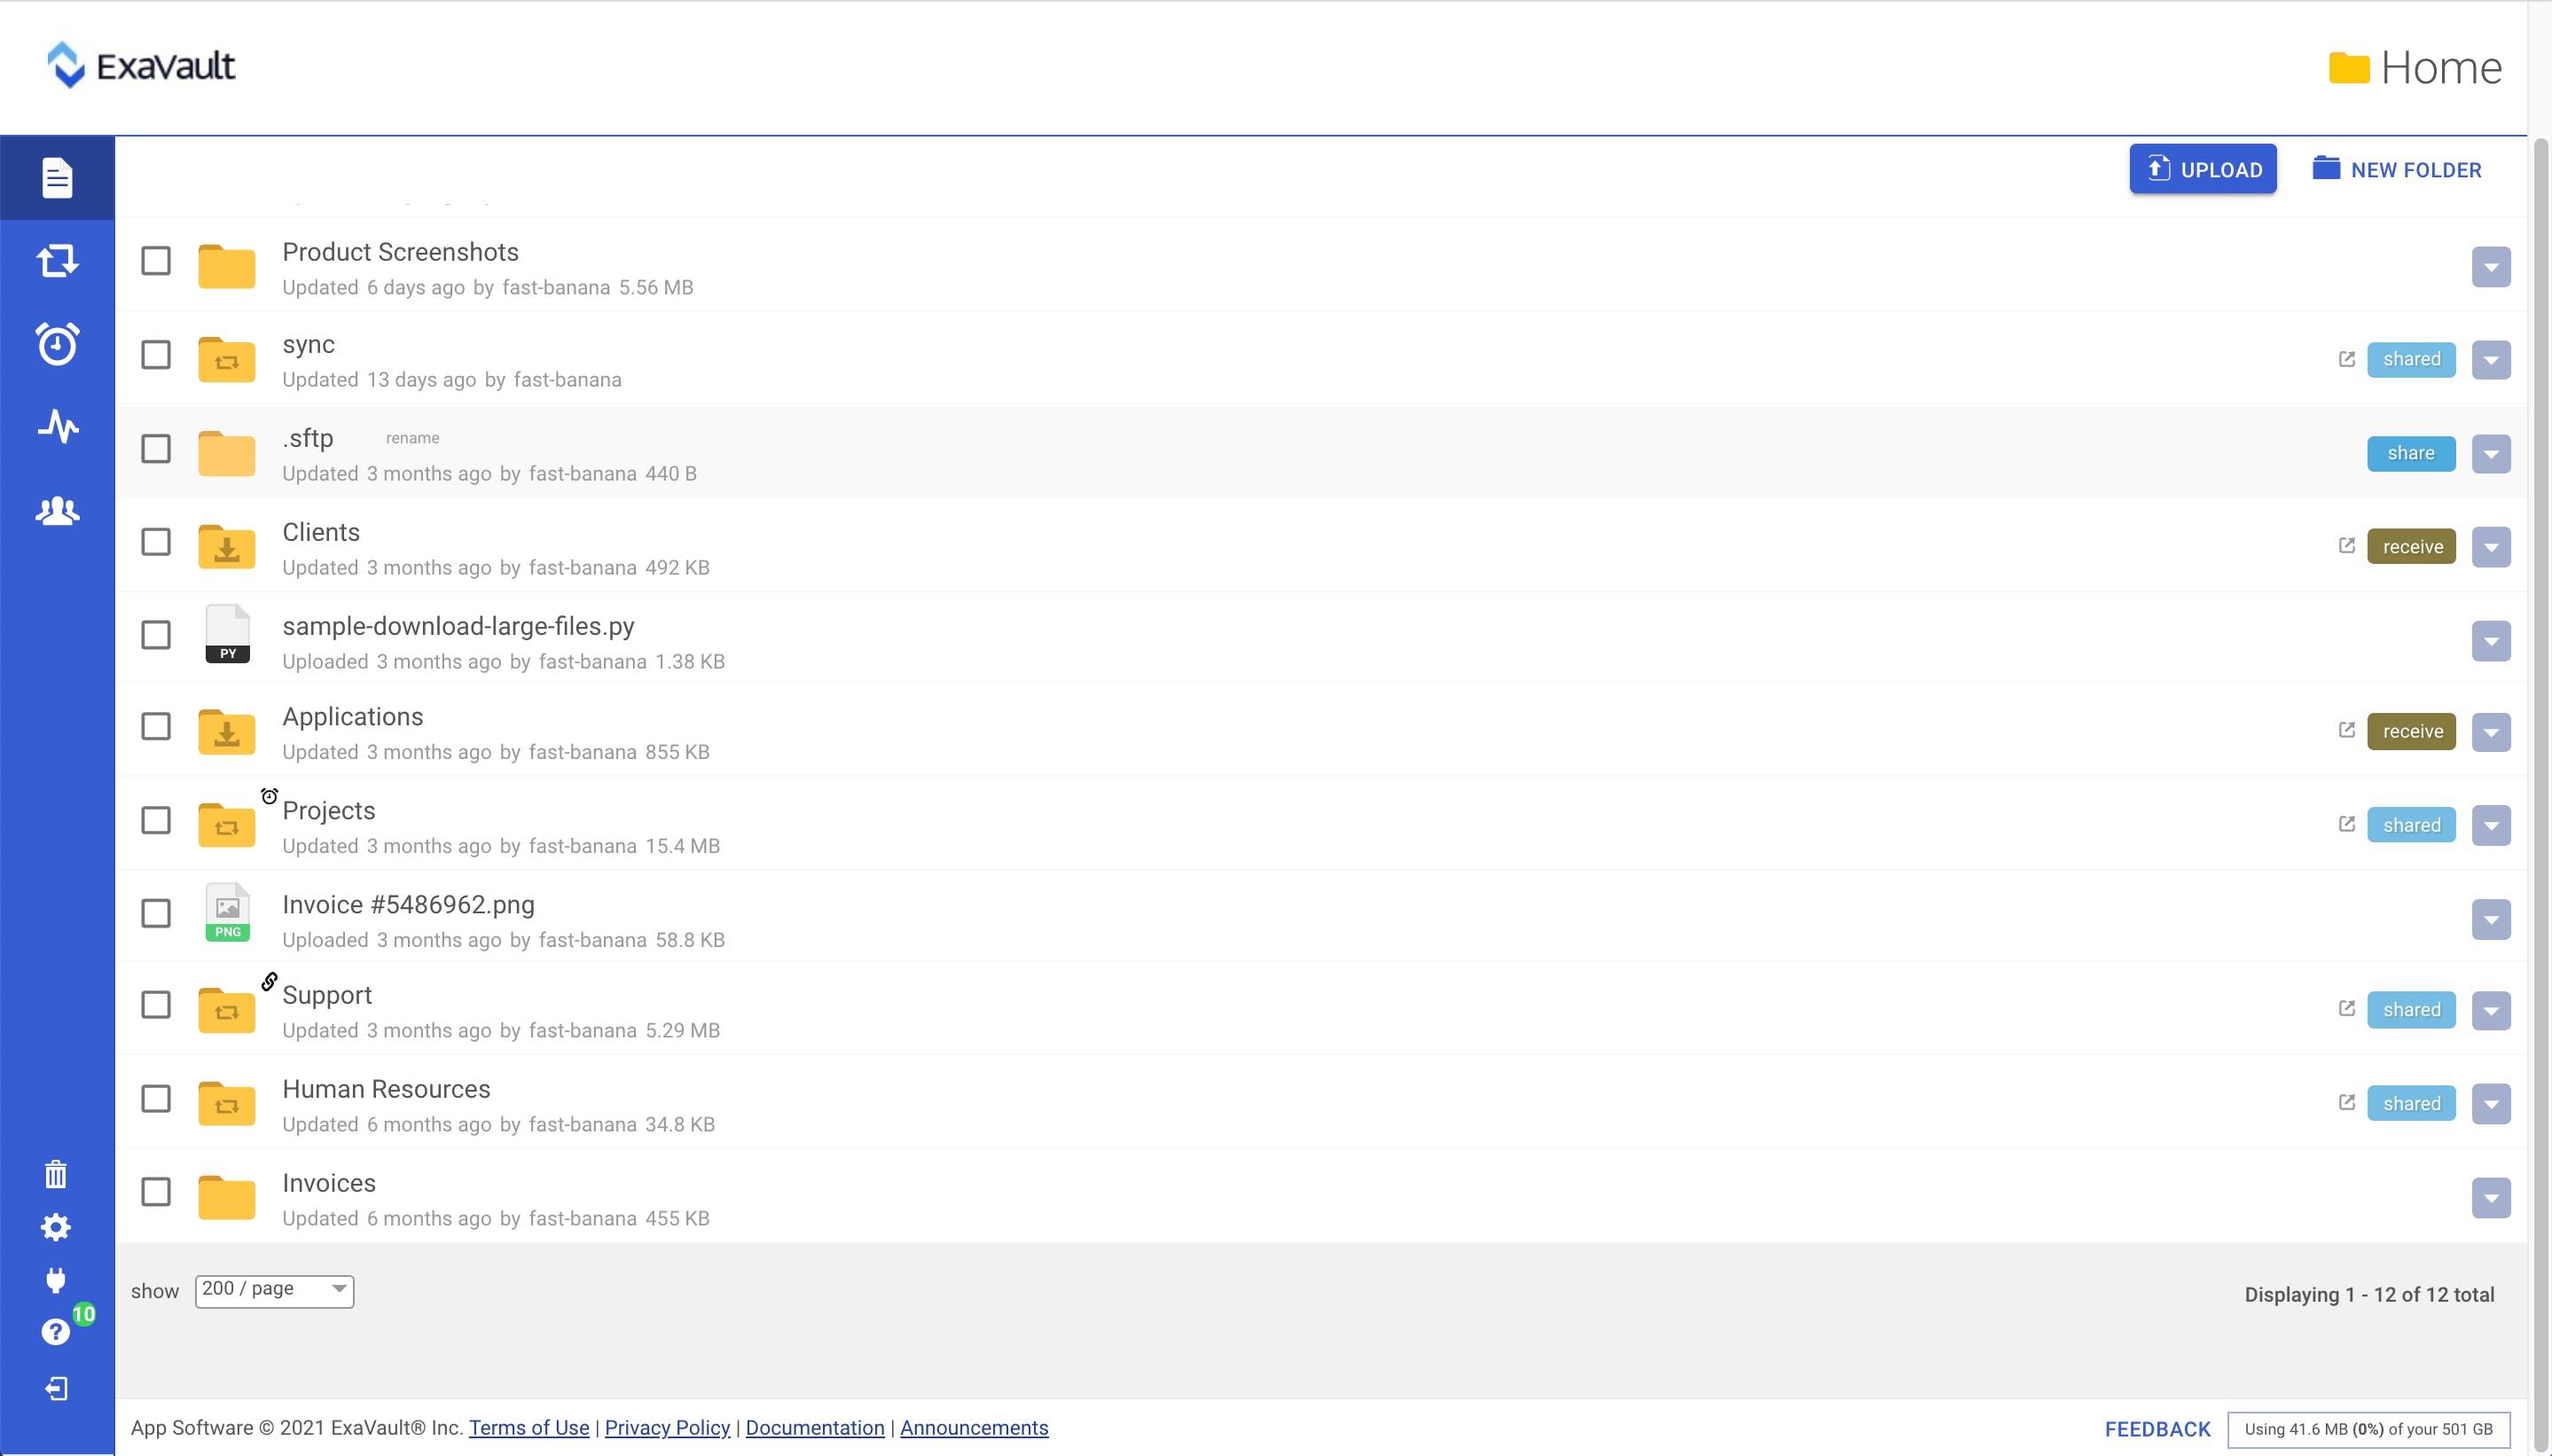 Creating SFTP folder.